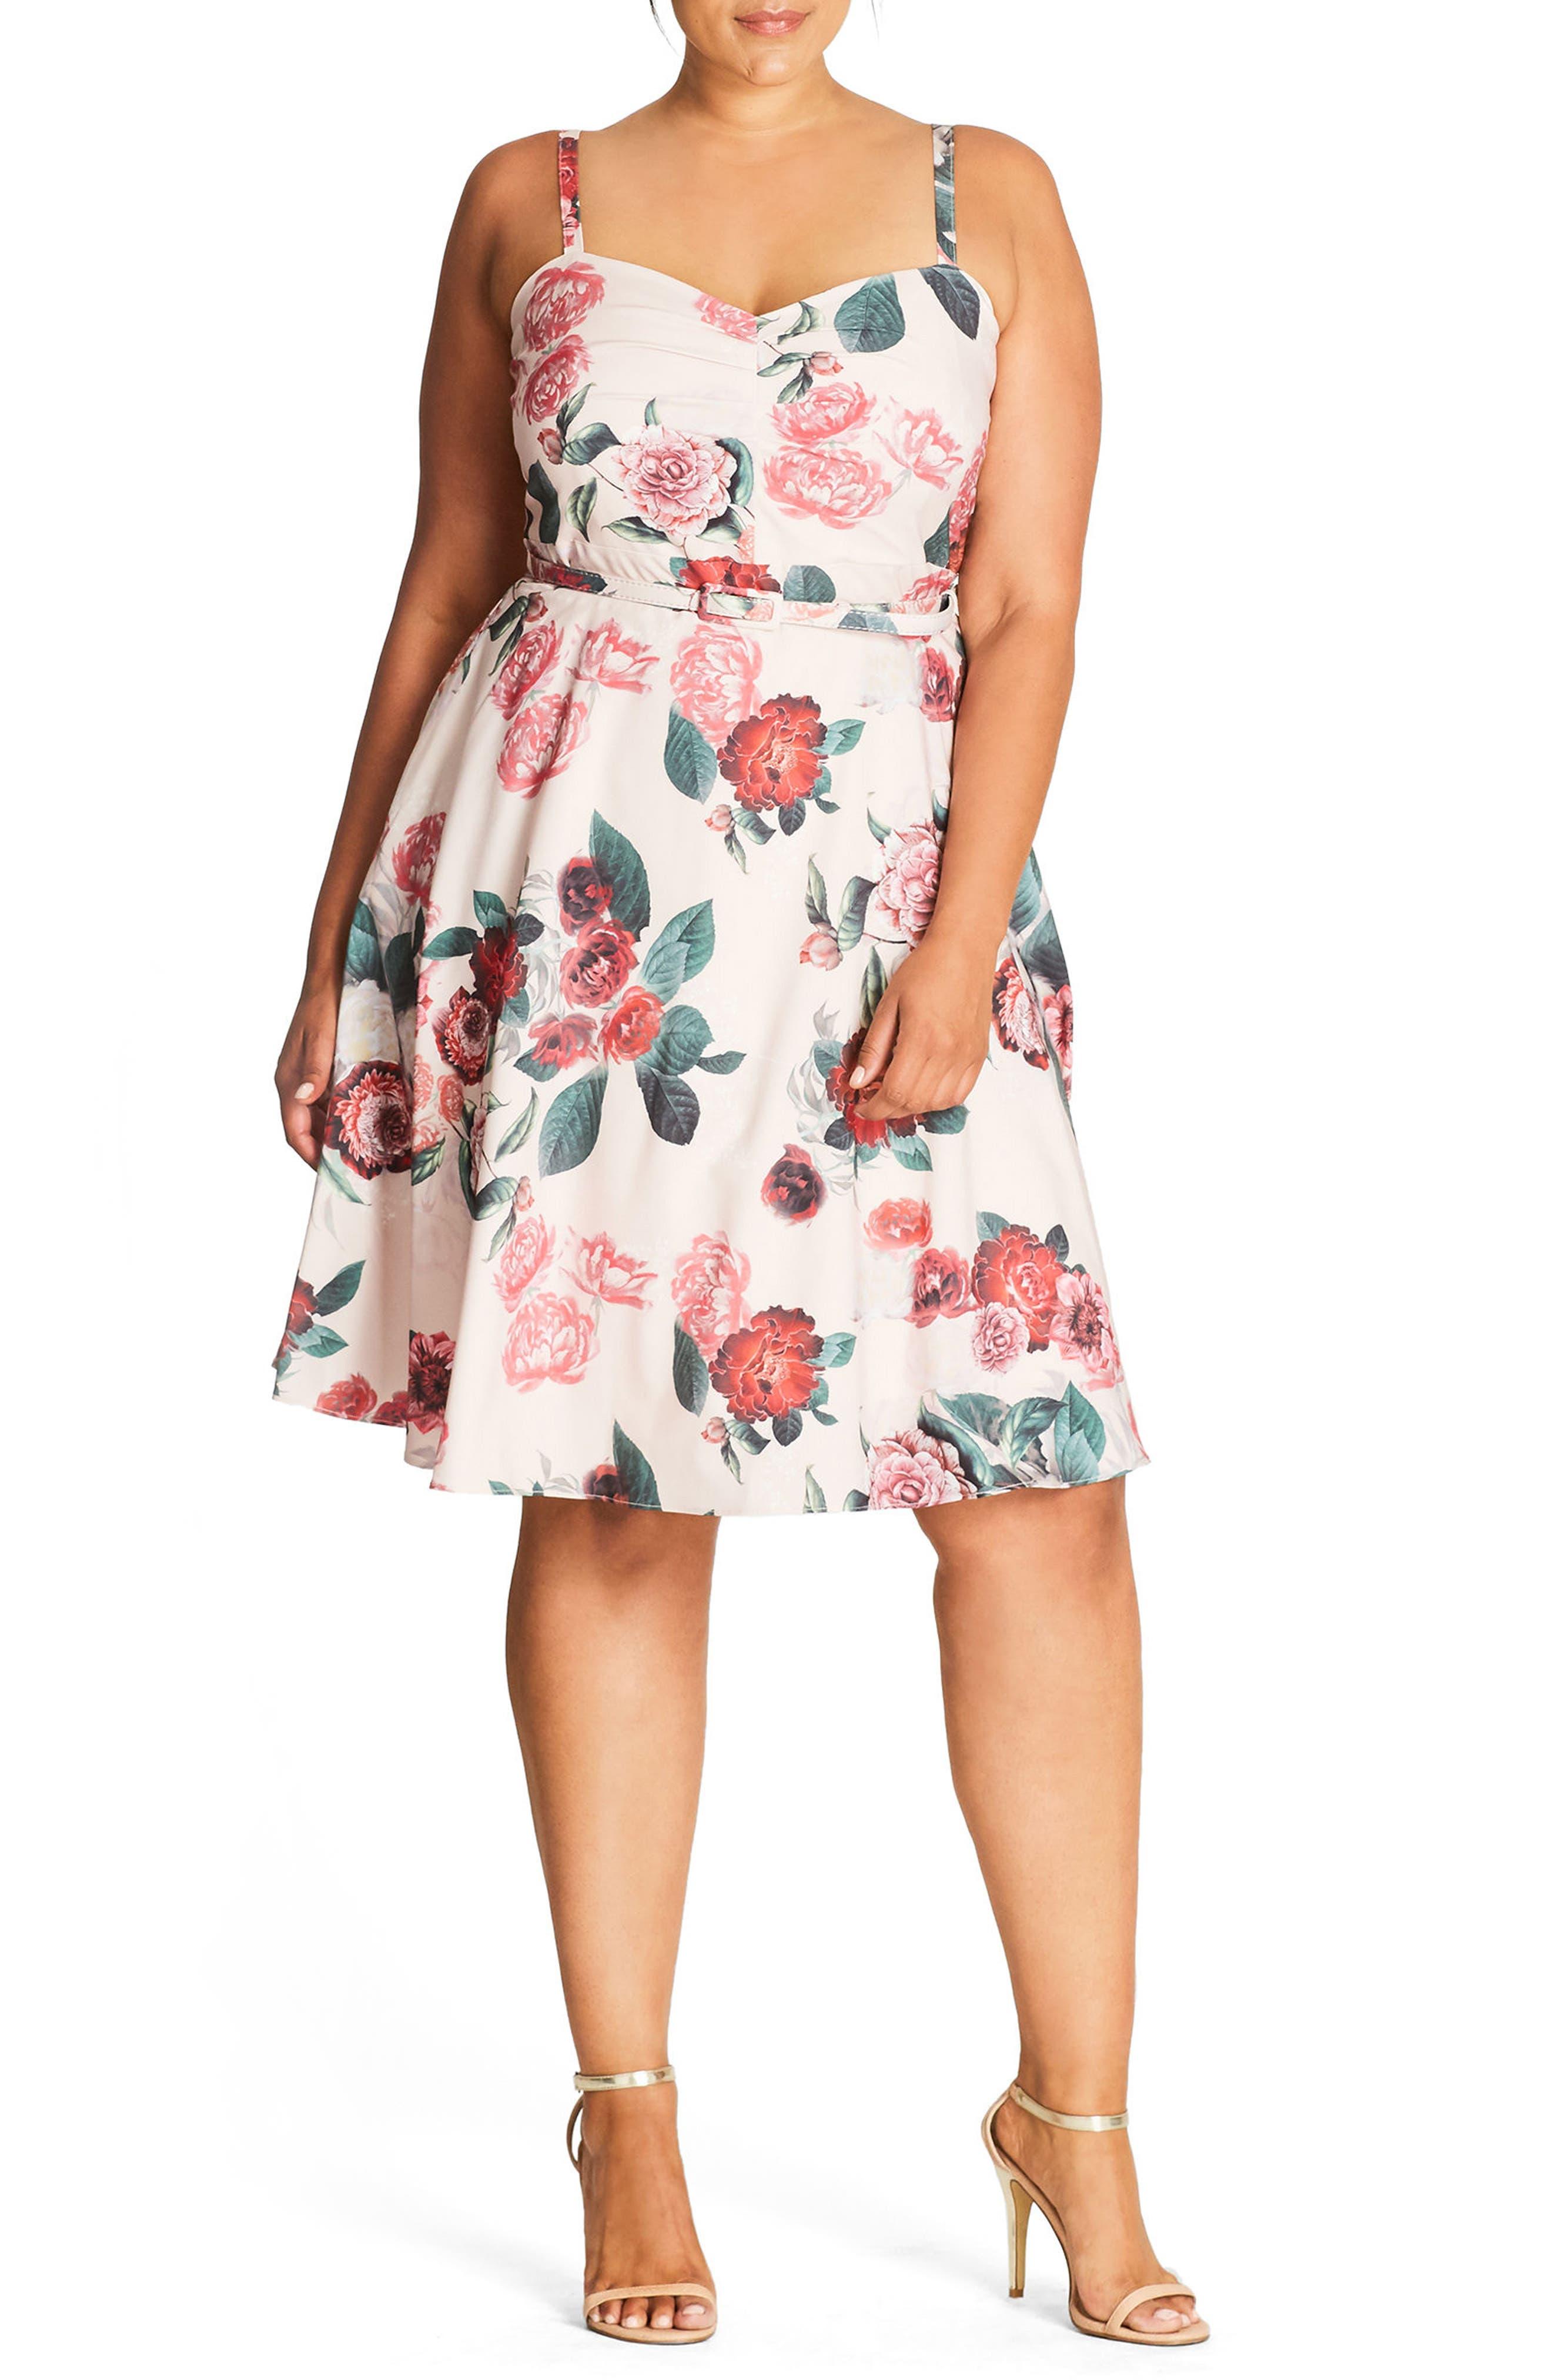 Main Image - City Chic Floral Print Fit & Flare Dress (Plus Size)